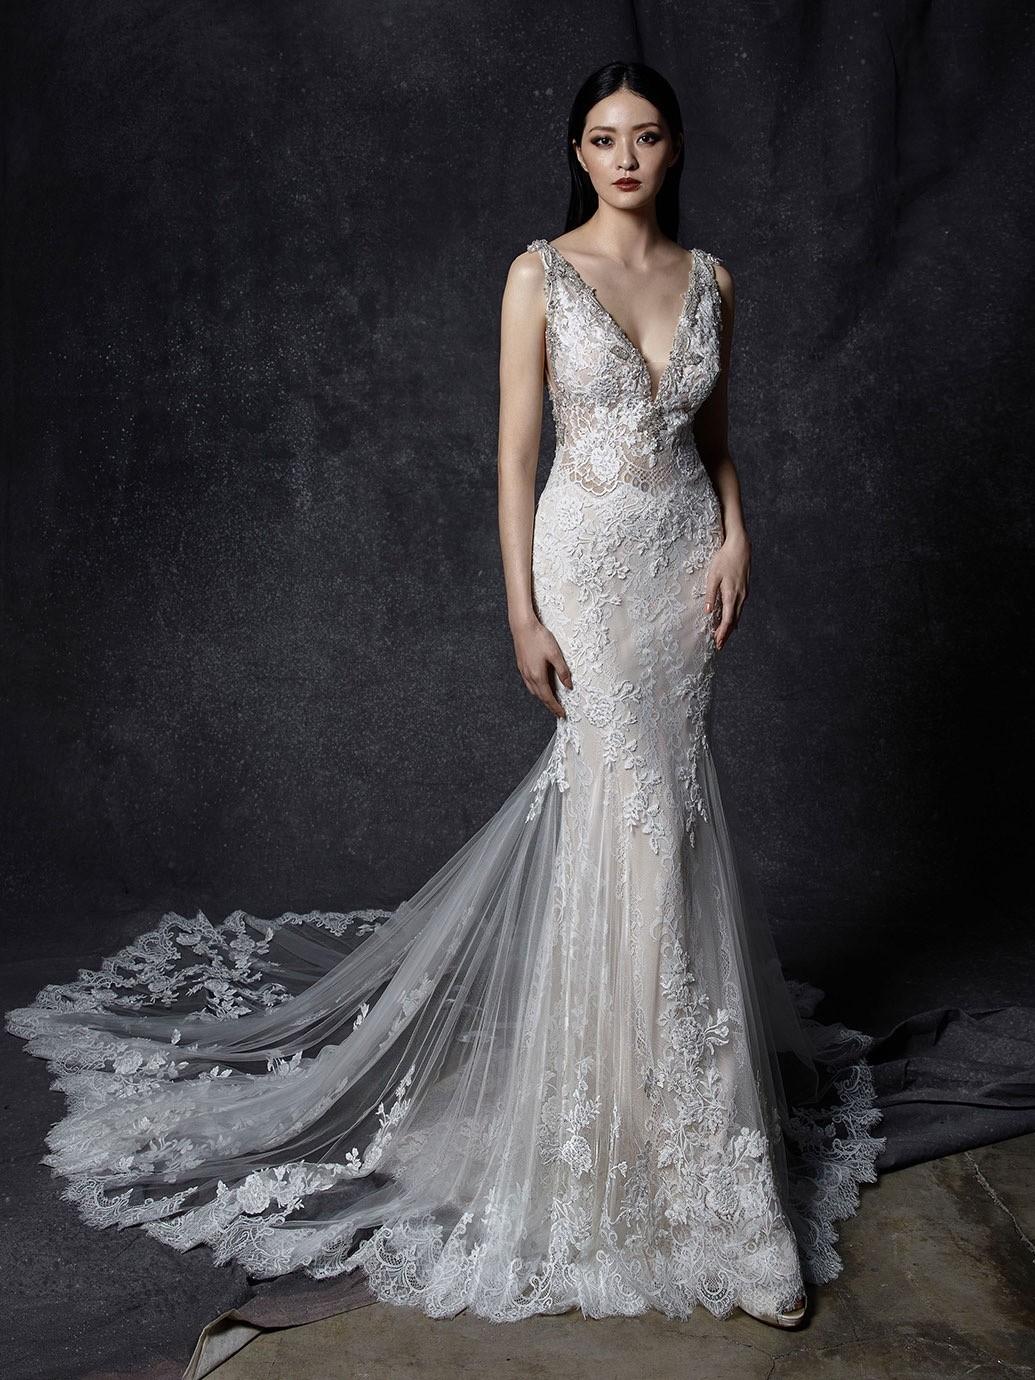 Brautkleid Modell Ocilia aus der Enzoani Kollektion 2020